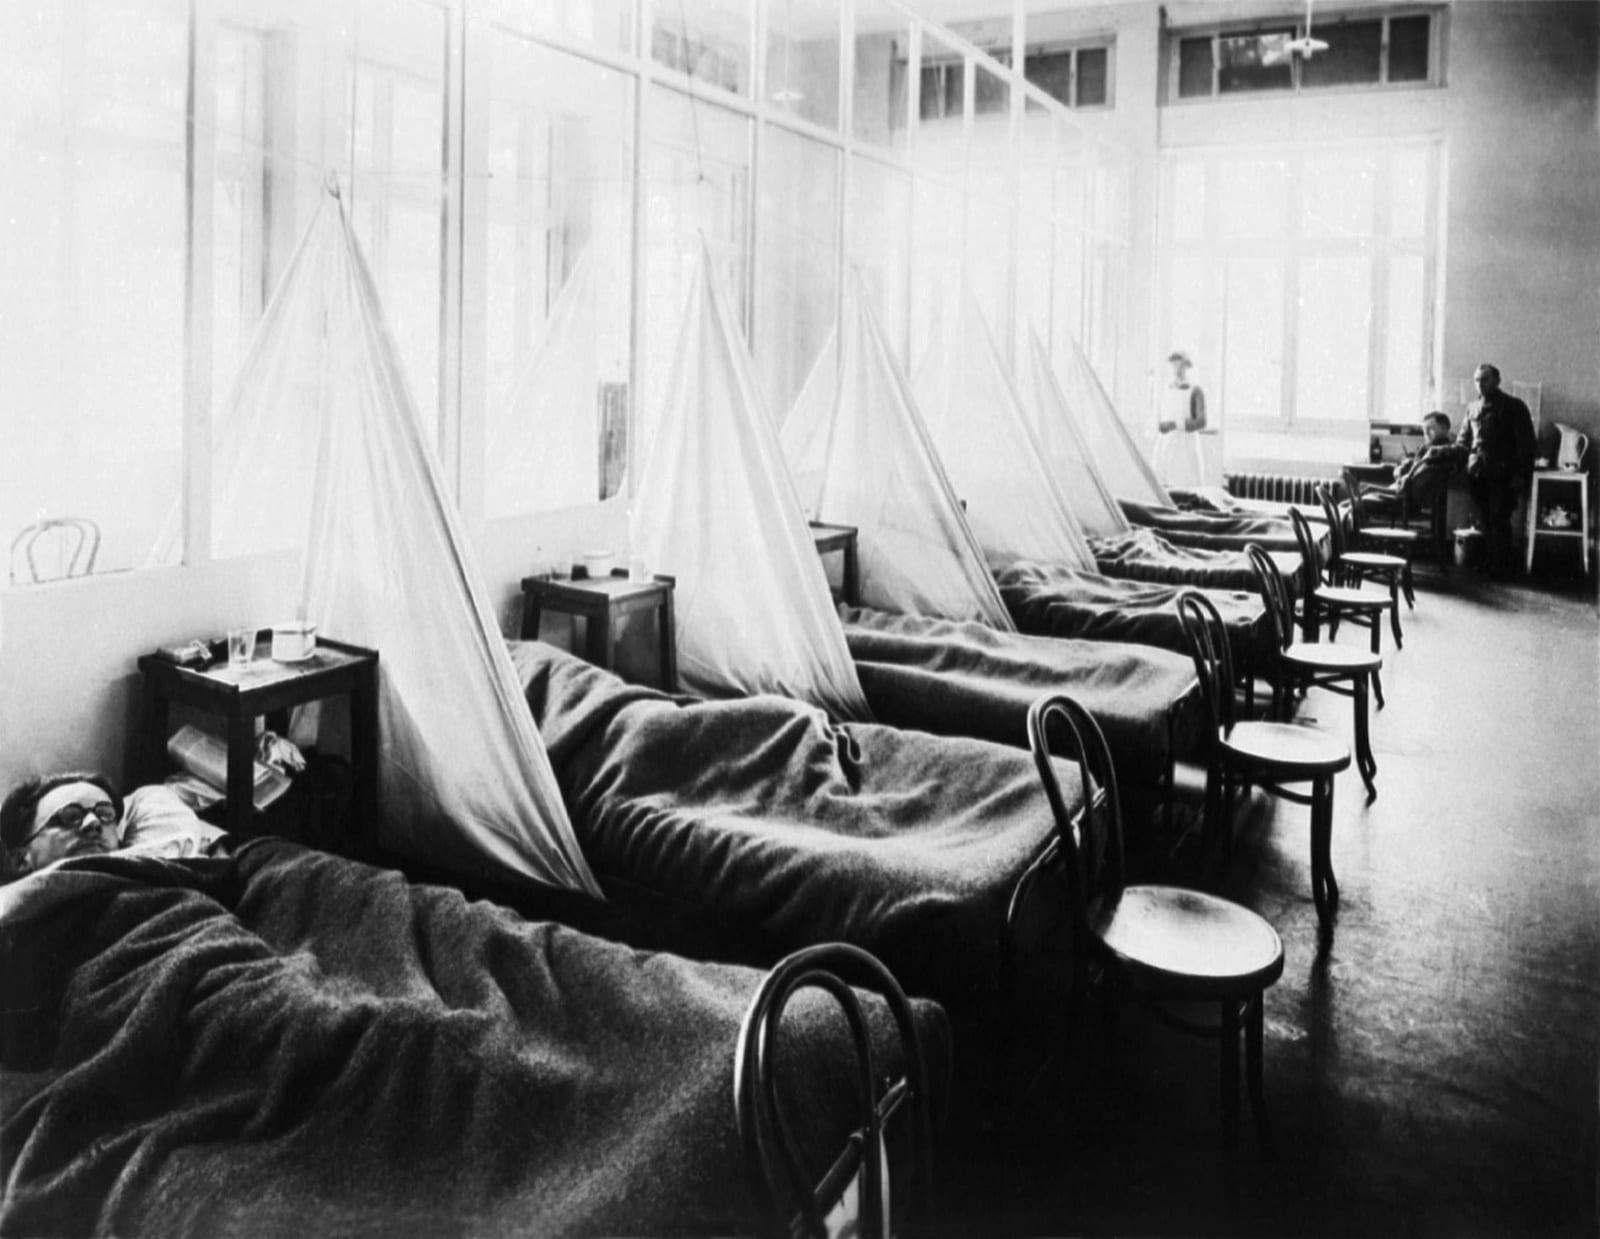 US Army Camp Hospital No. 45 France Spanish Flu Ward 1918